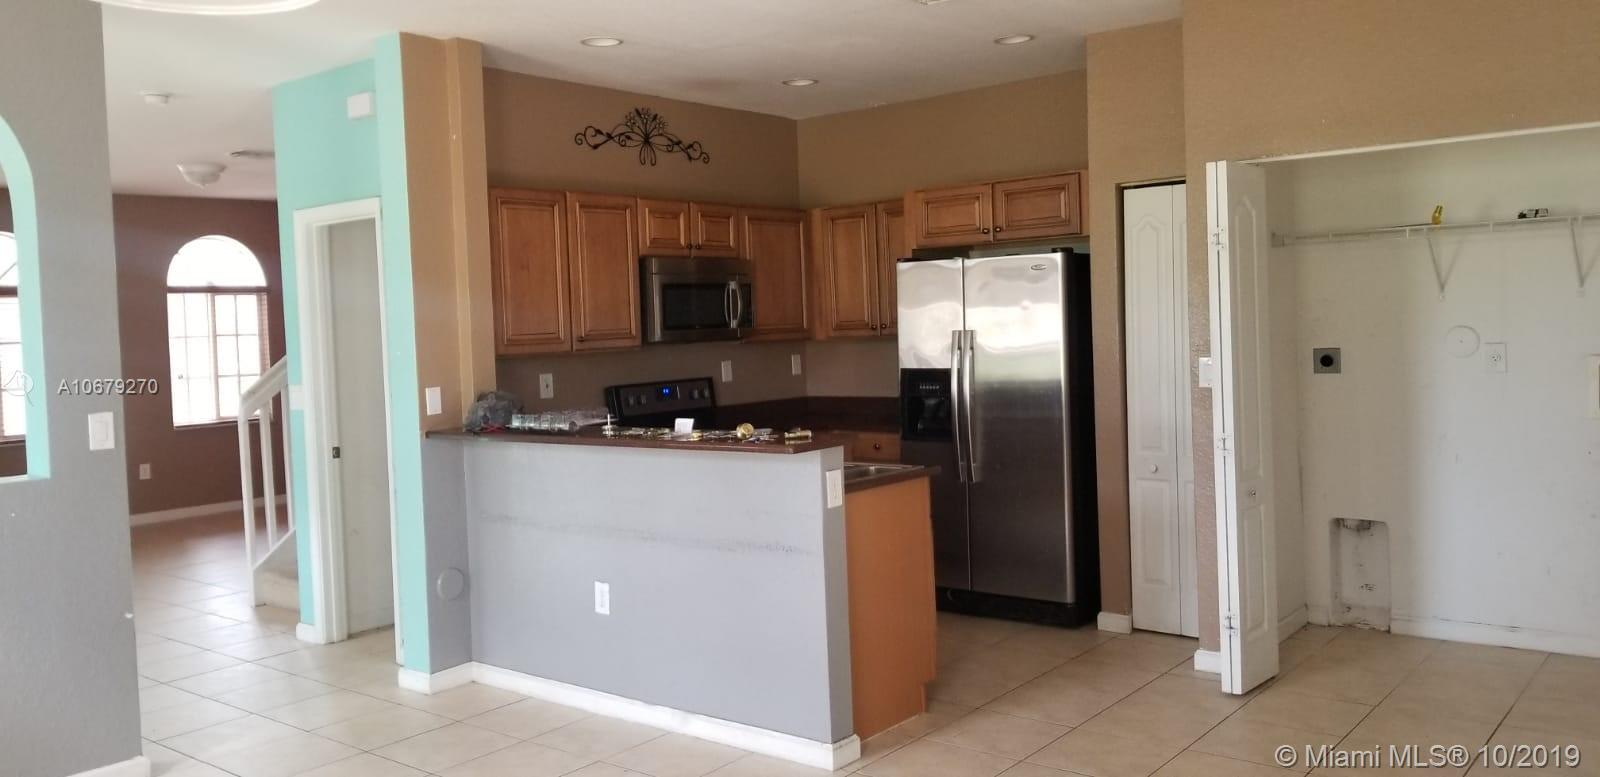 13972 SW 279th Ln #13972, Homestead, FL 33032 - Homestead, FL real estate listing